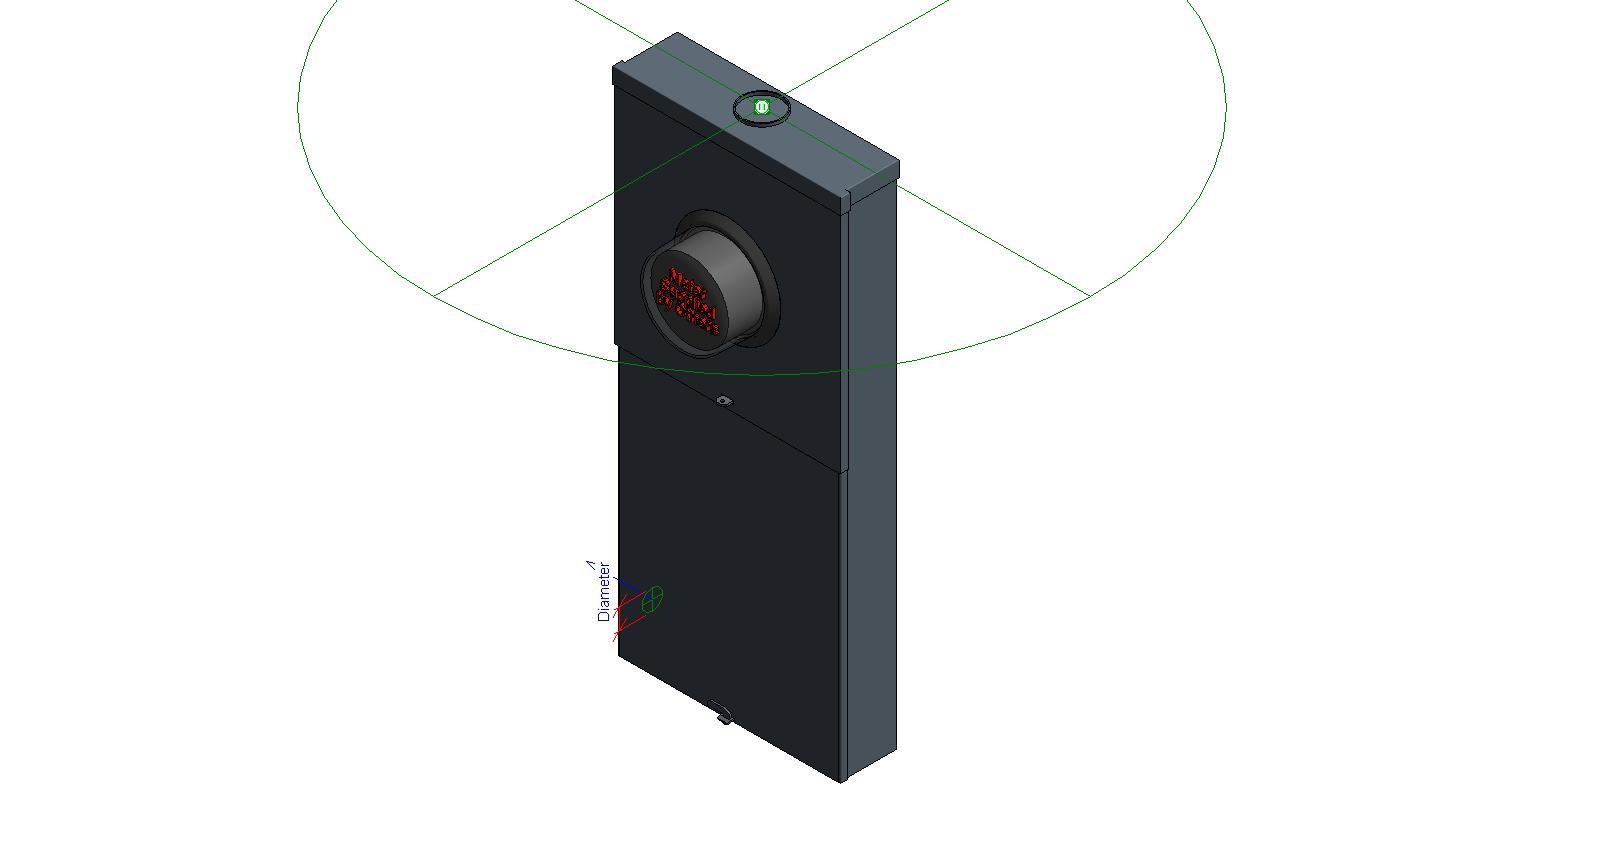 Leviton Decora 3 Way Switch Installation Instructions Wiring Diagram